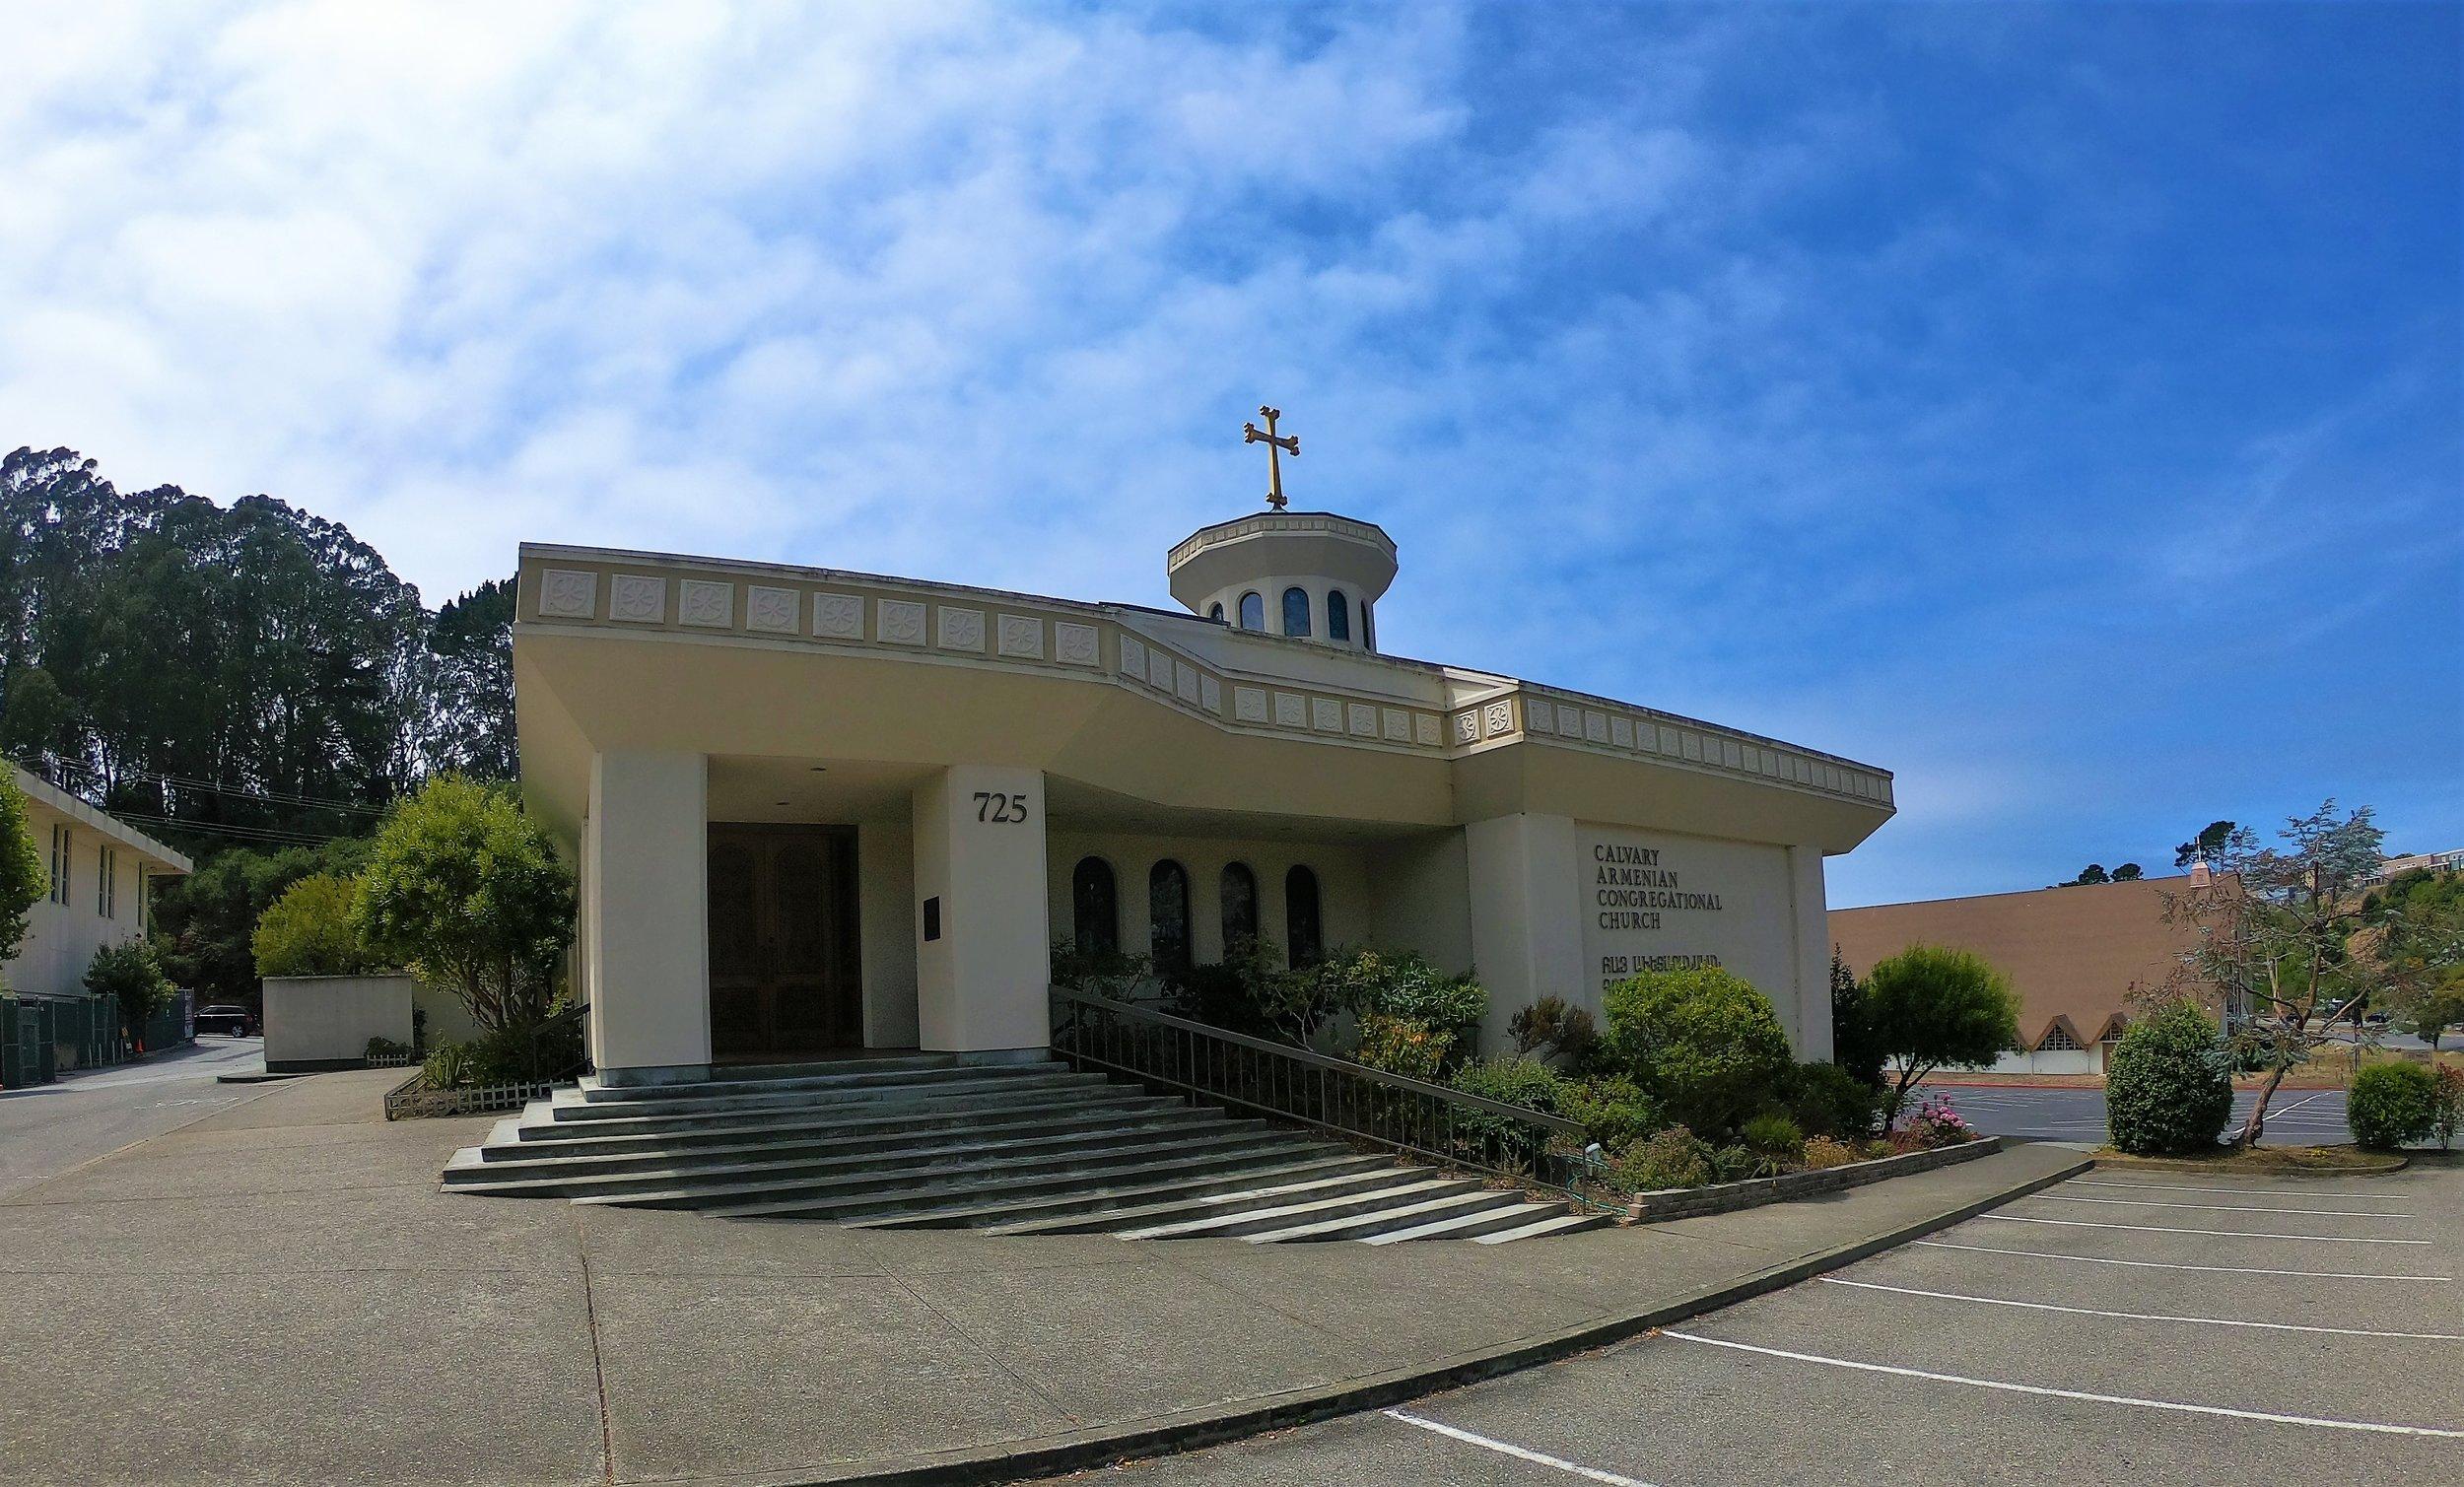 Calvary Armenian Congregational Church in San Francisco, California